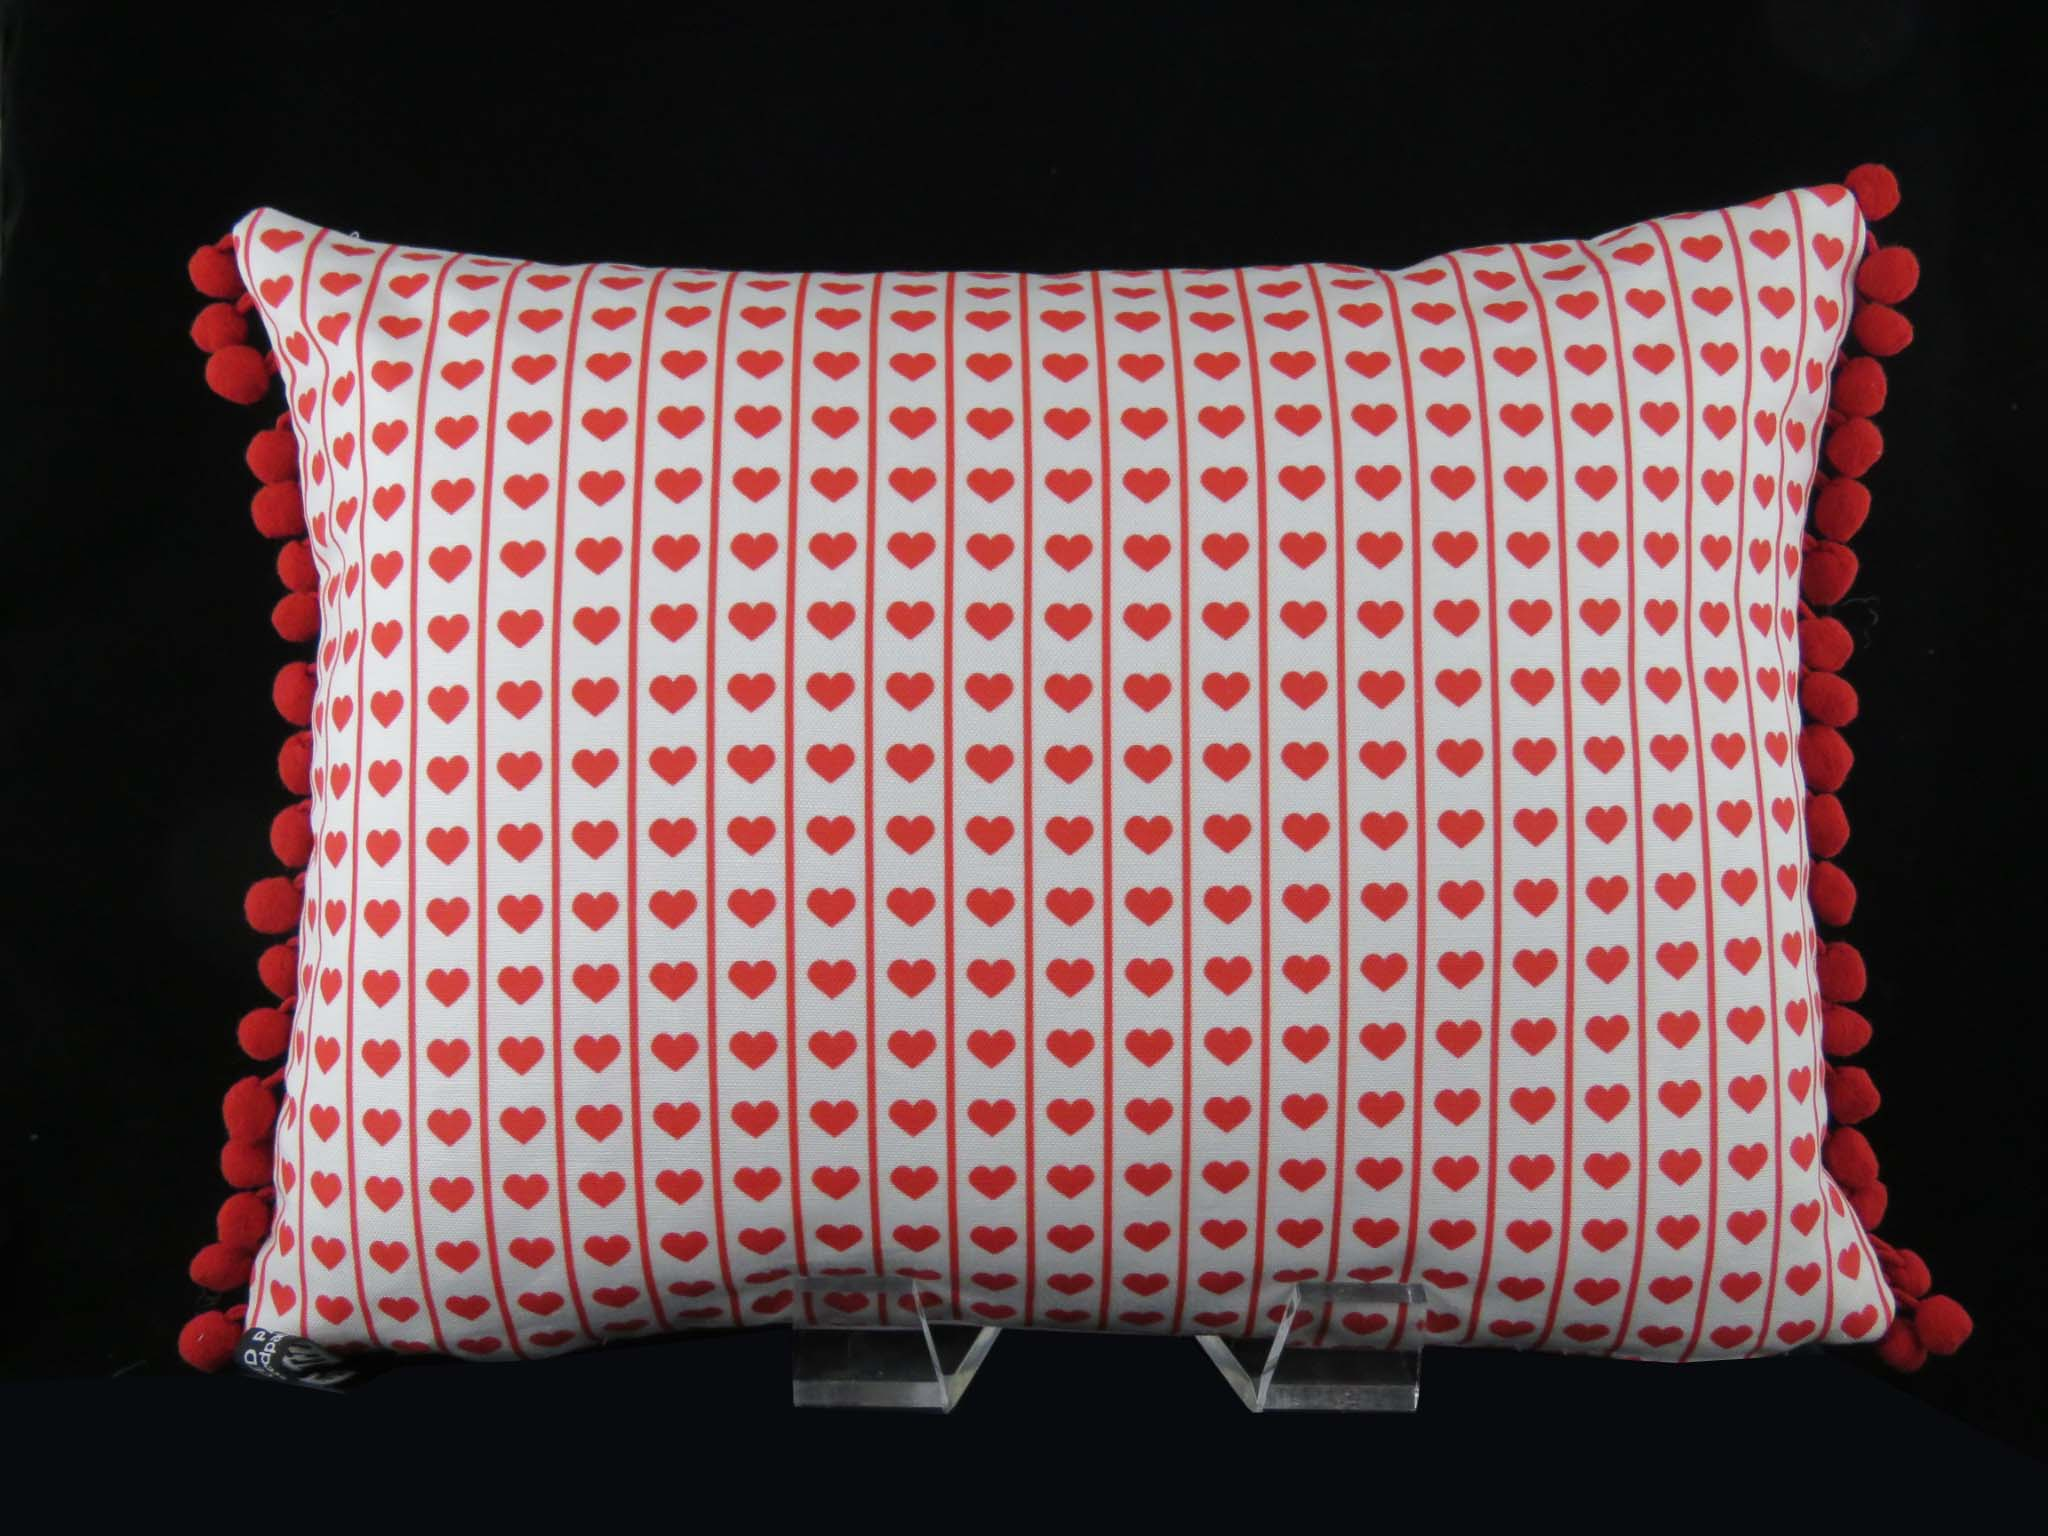 bat-mitzvah-pillow-hearts-and-pompoms-CIG_IMG003FW.jpg